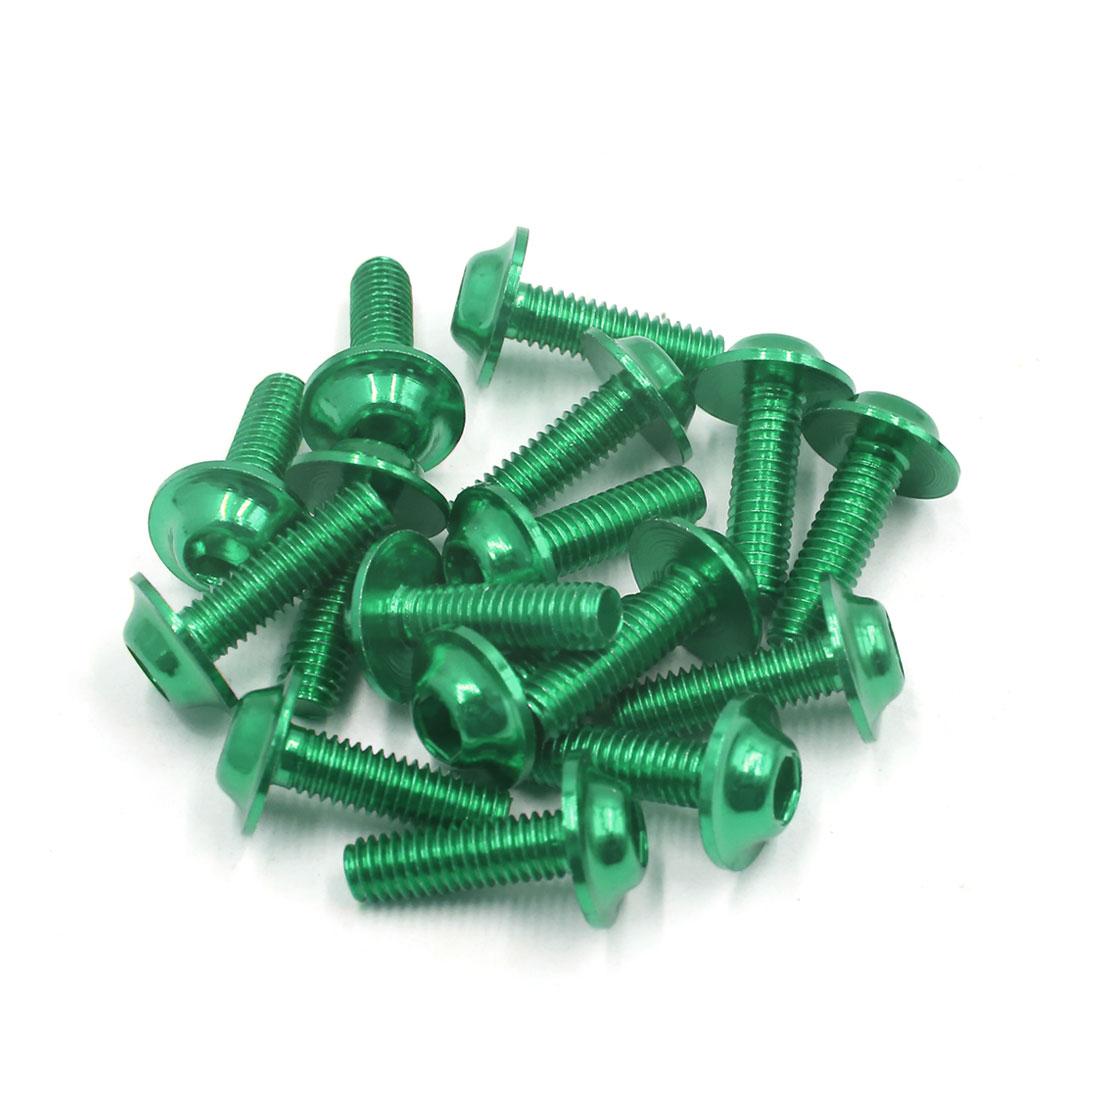 16Pcs Green Metal 6mm Thread Dia Motorcycle Hexagon Bolts Screws